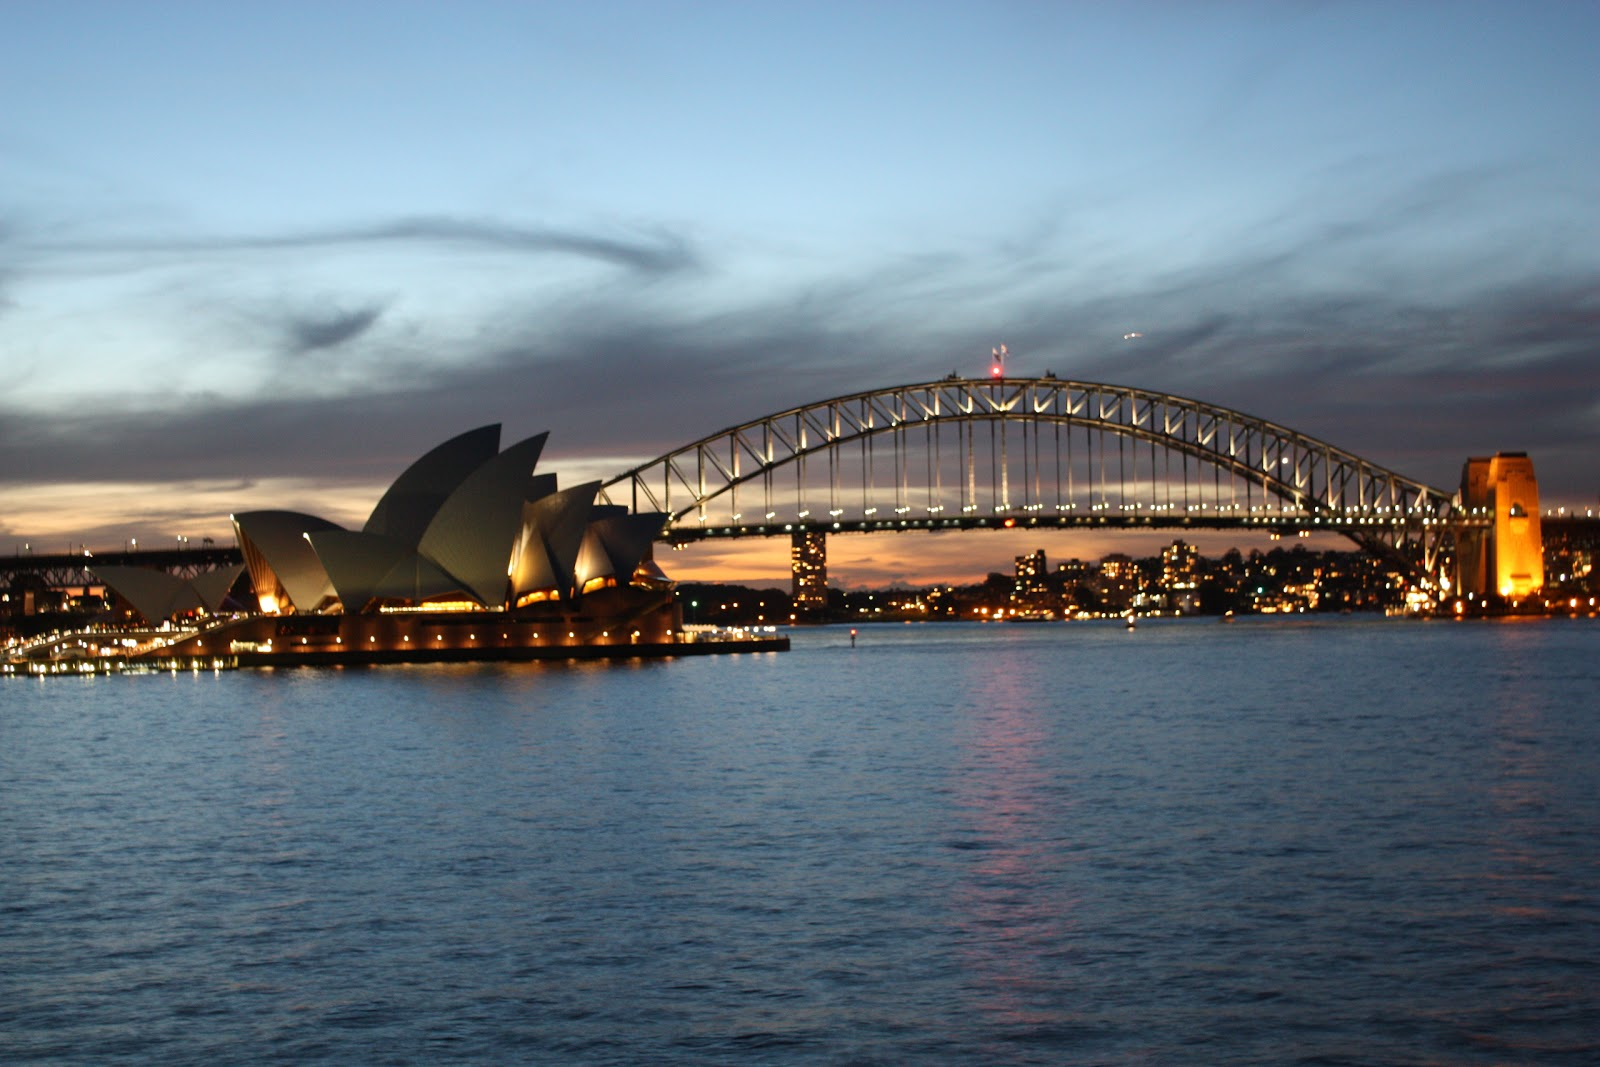 http://2.bp.blogspot.com/-AN2Kpwq839M/TjUpBrvaPEI/AAAAAAAAJYw/Kjd_f_AJ3NY/s1600/Sydney%20Harbour%20postcard.JPG